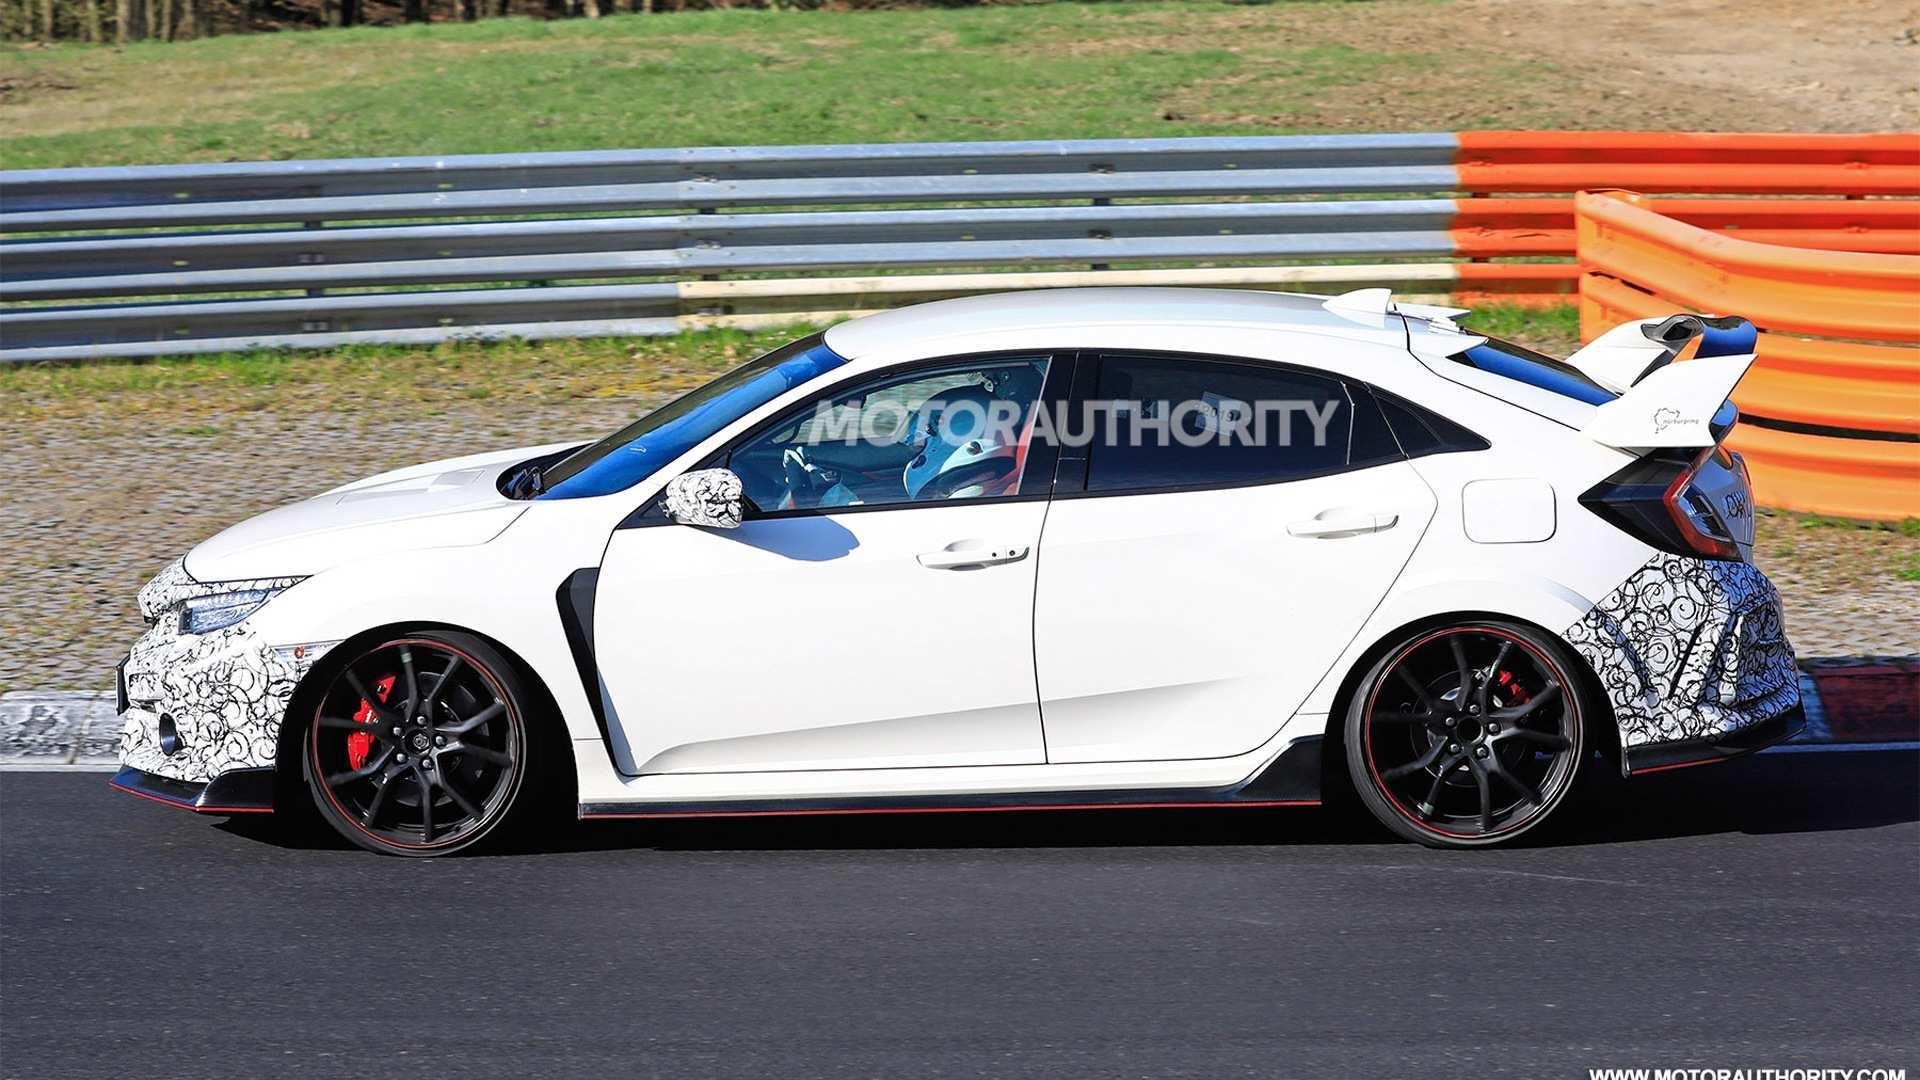 42 Great Honda Civic 2020 Concept Specs for Honda Civic 2020 Concept